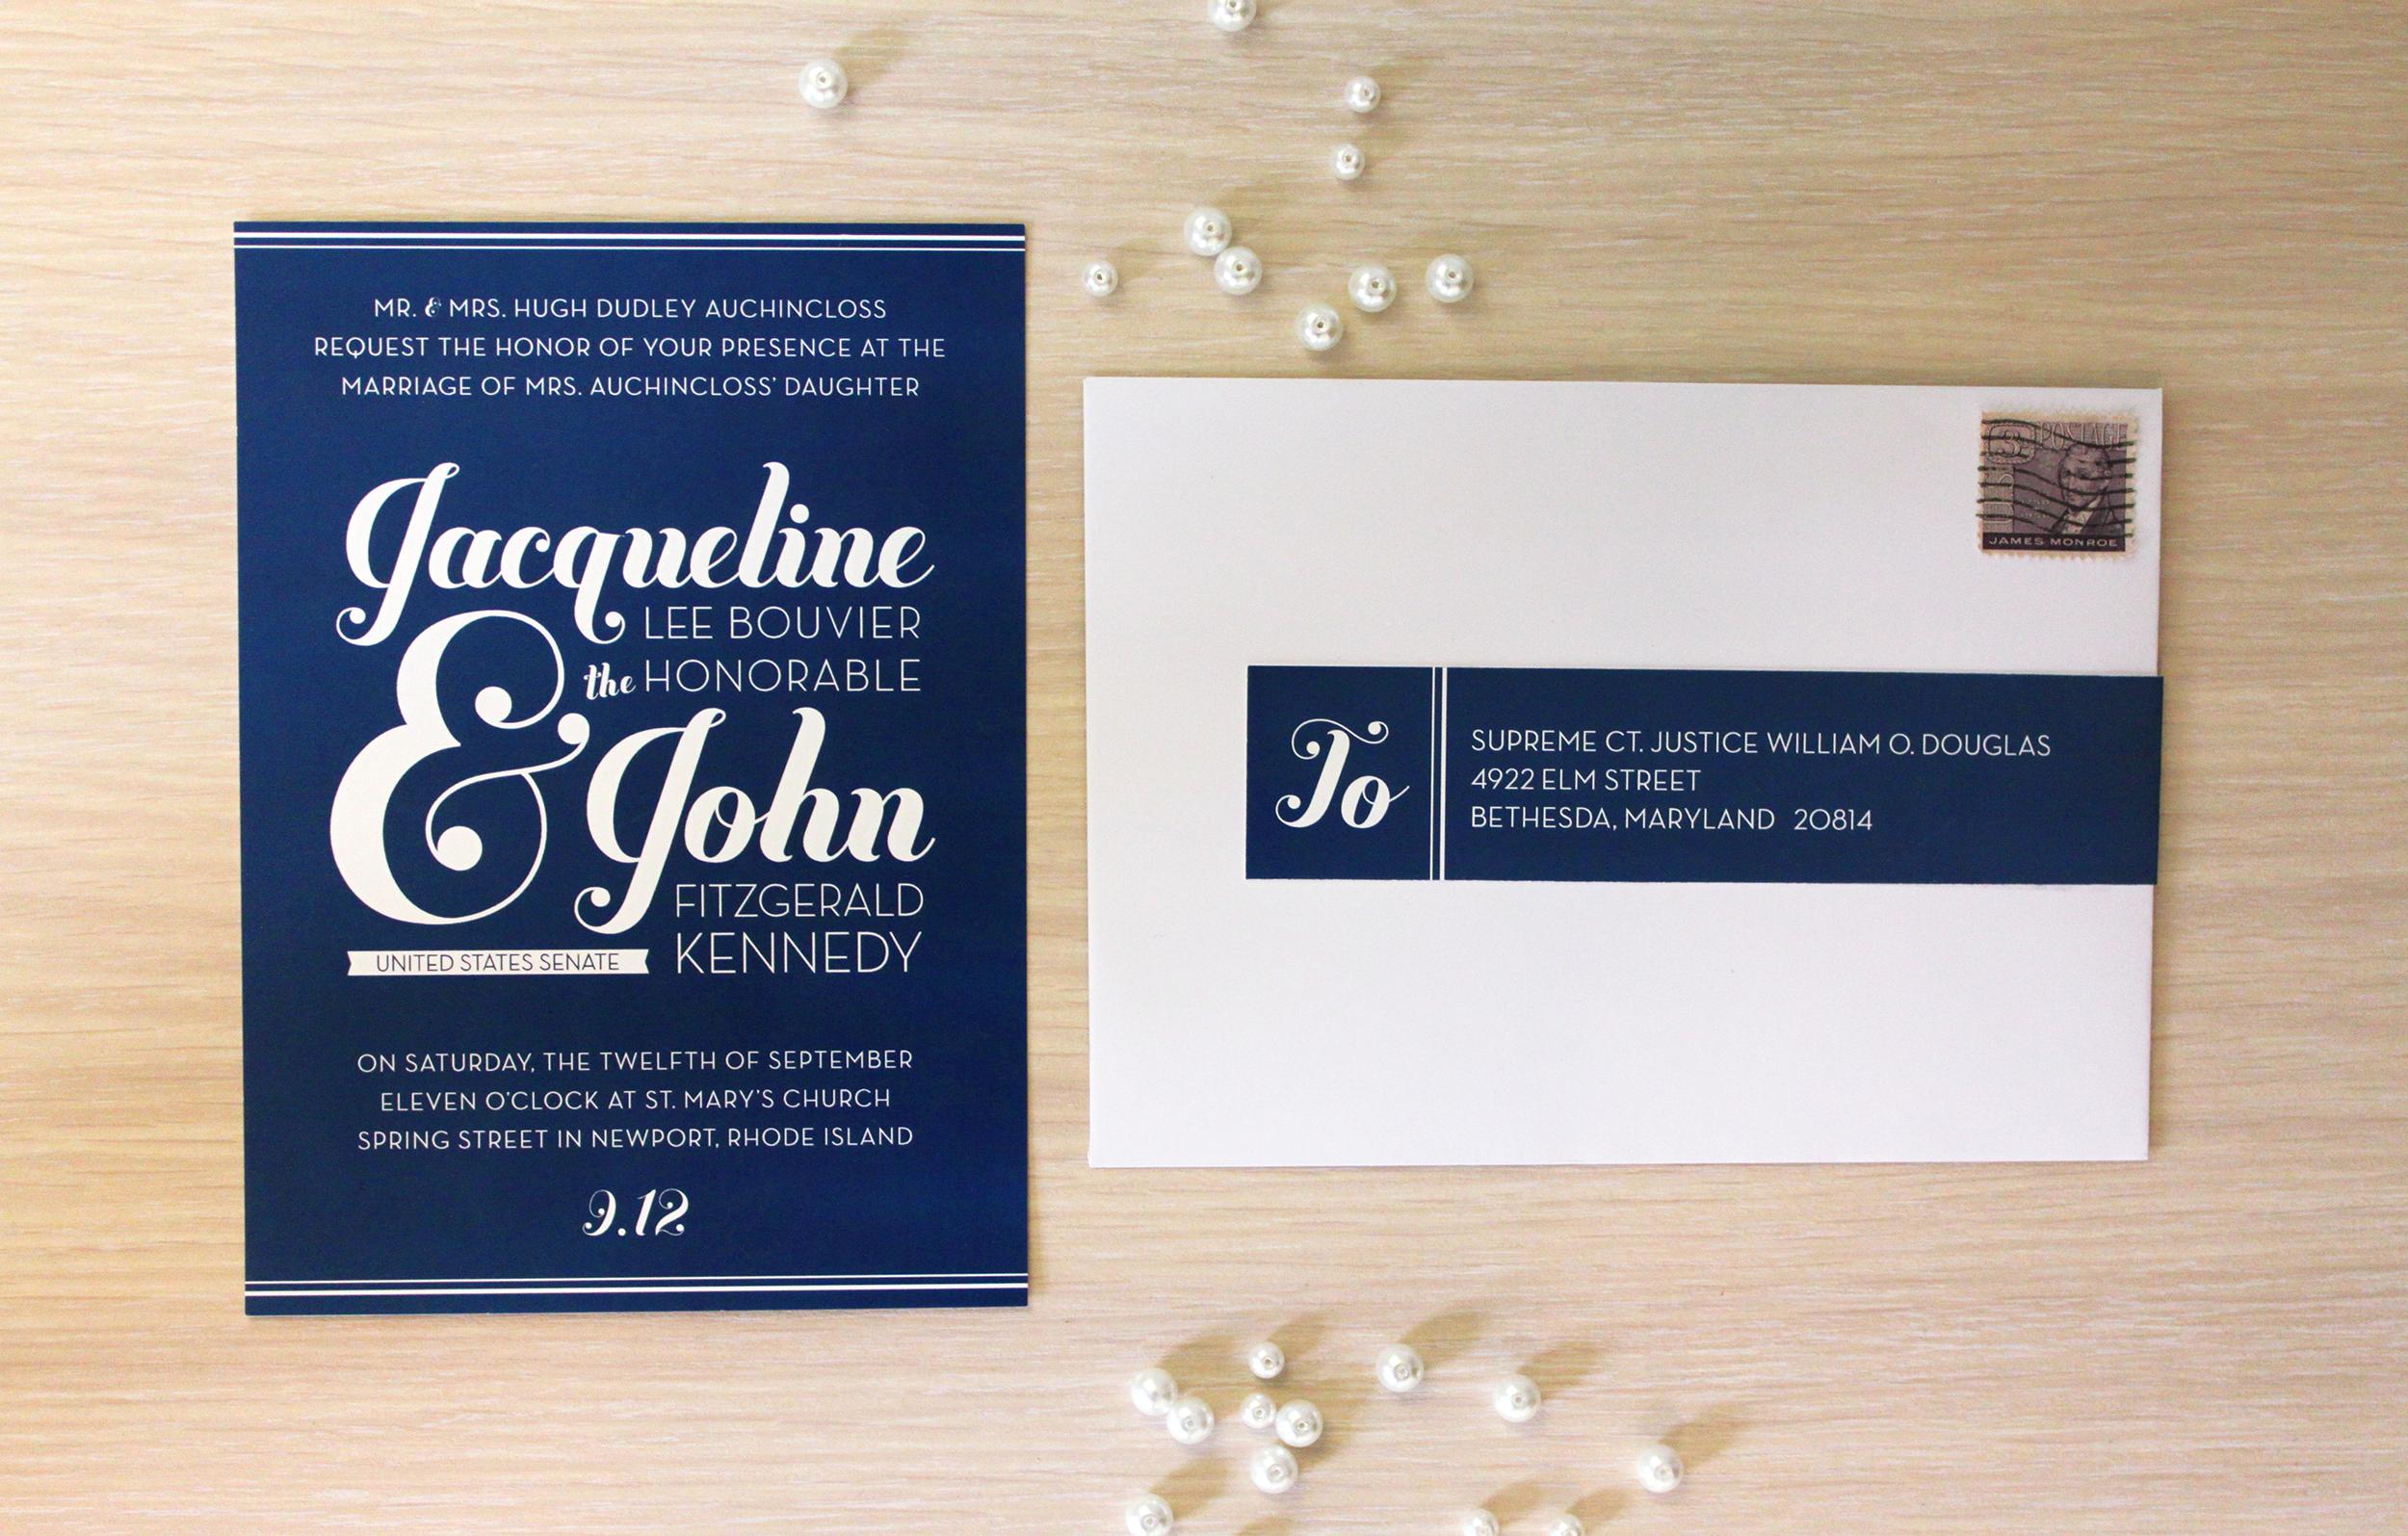 jfk invite envelope2.png